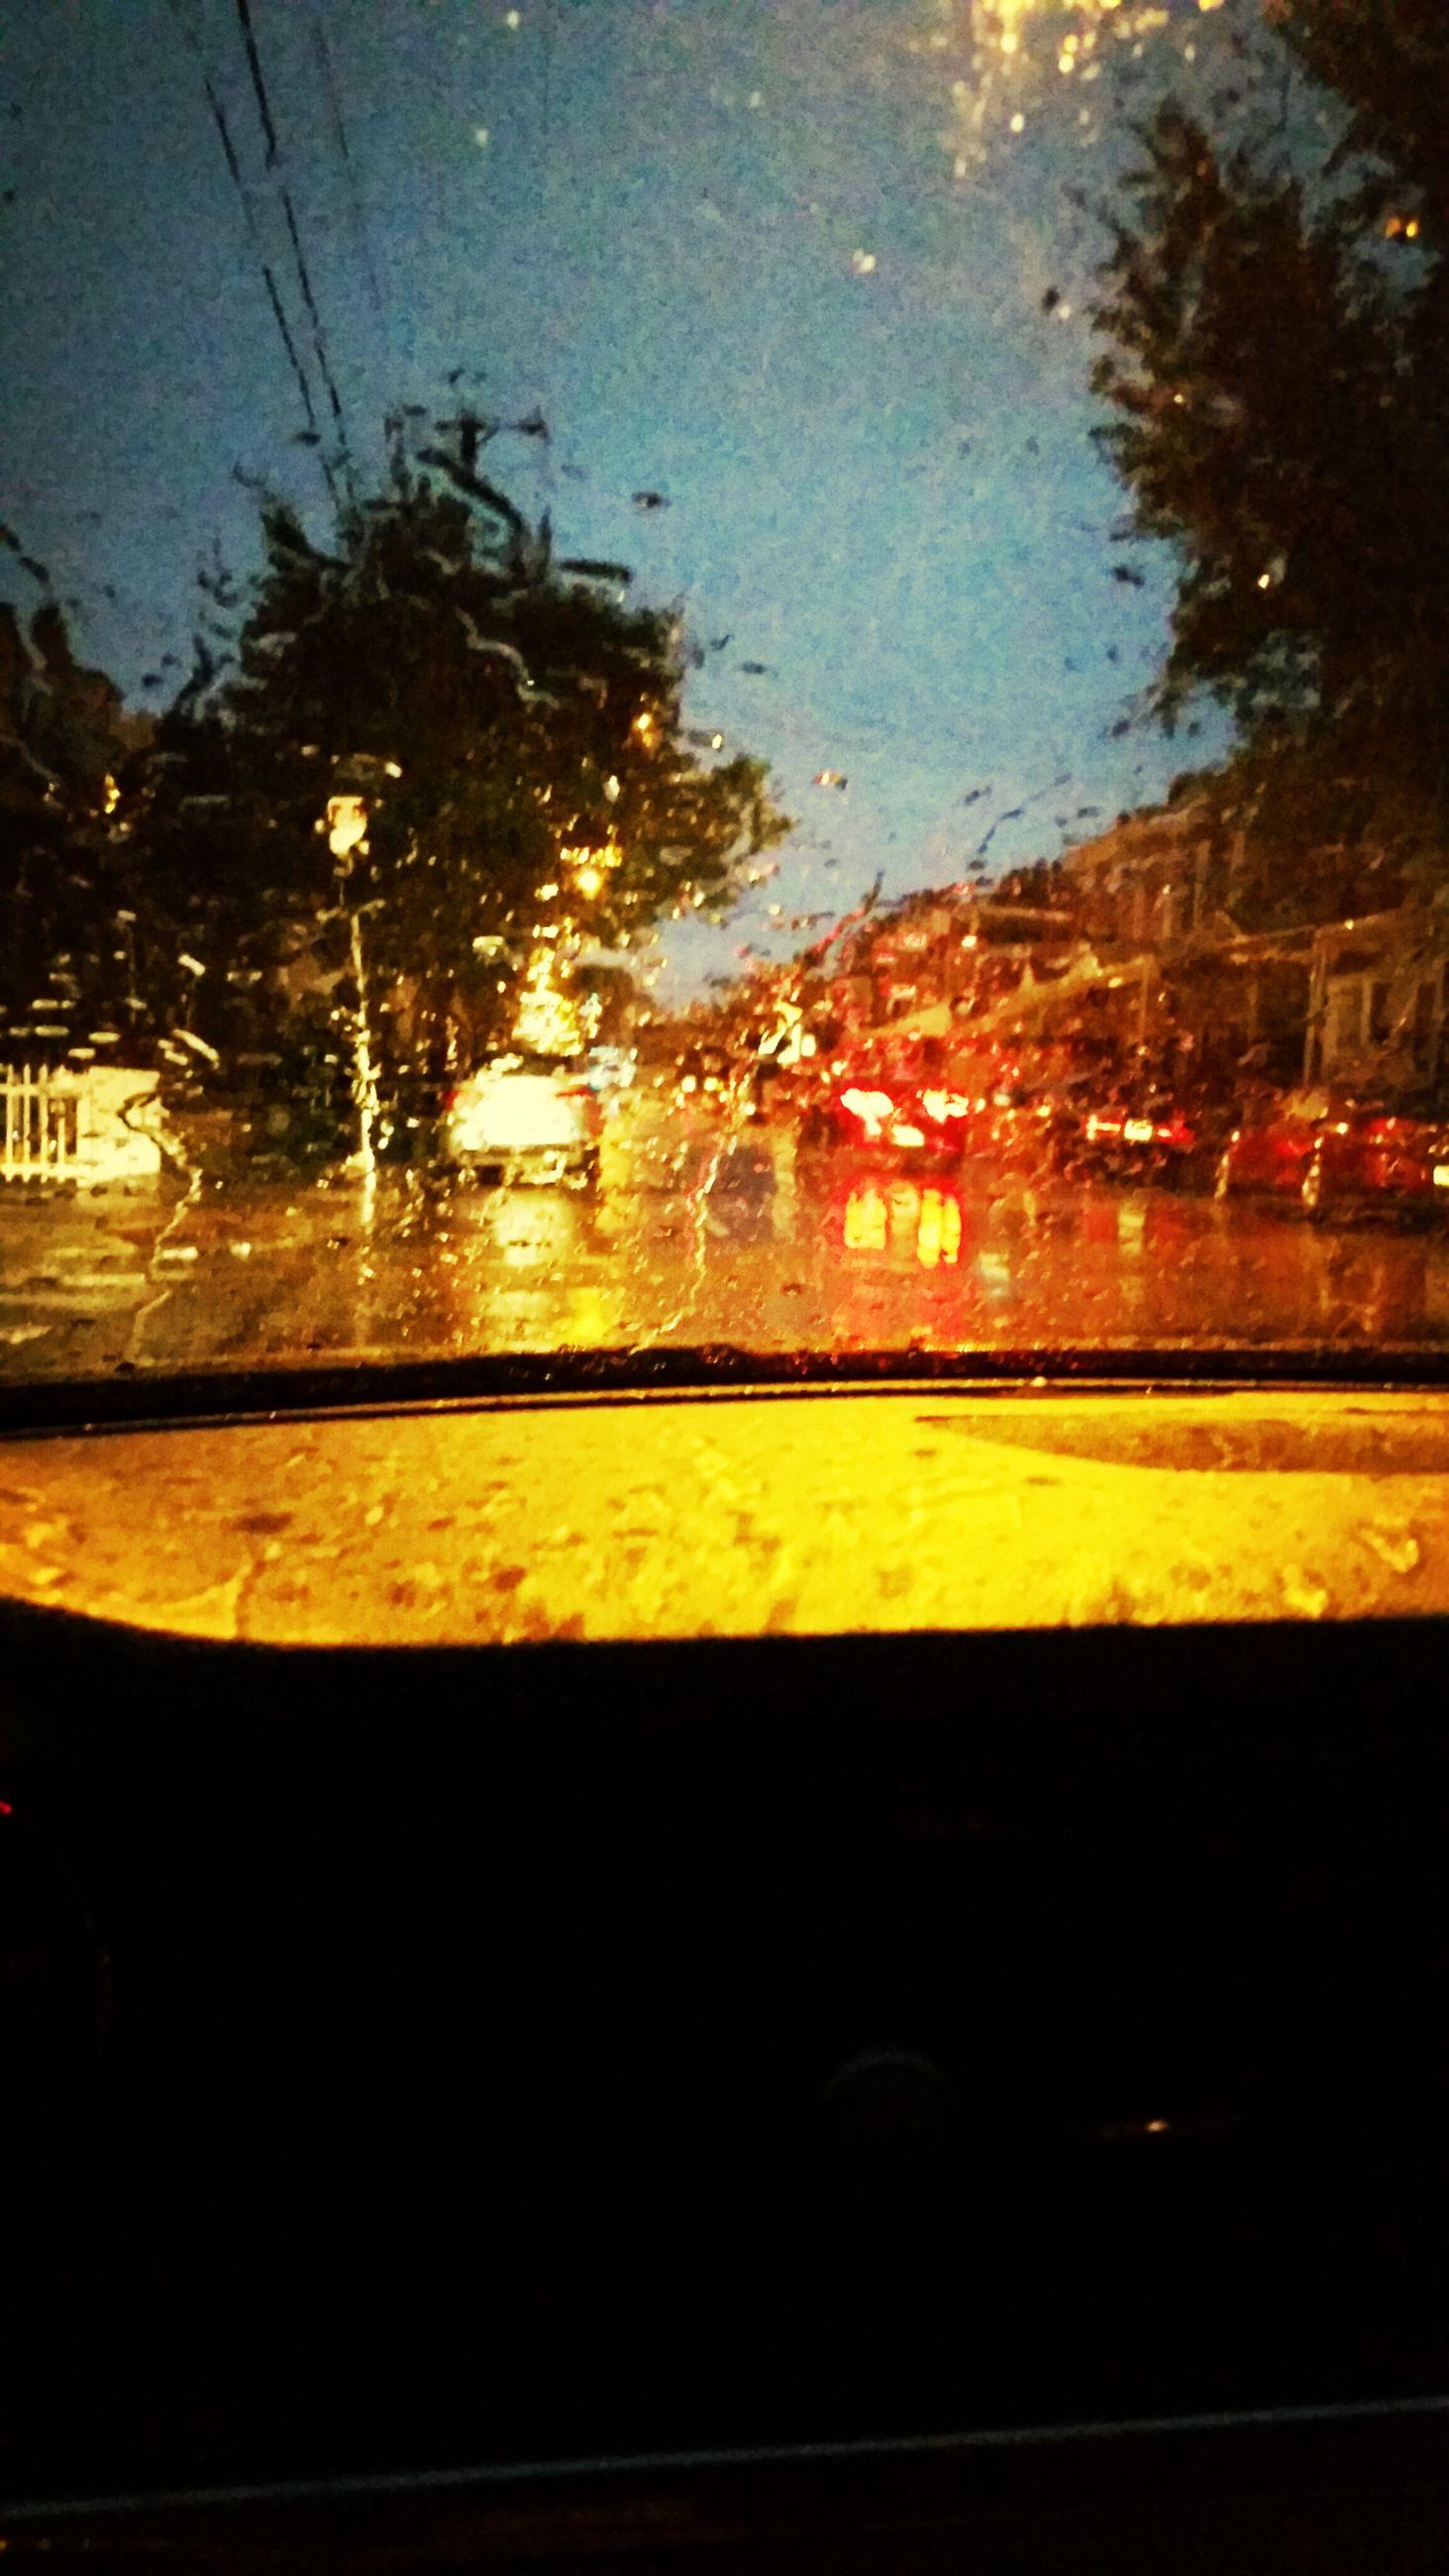 wet, rain, drop, window, water, transparent, glass - material, season, raindrop, car, tree, weather, indoors, glass, sky, transportation, vehicle interior, monsoon, street, night